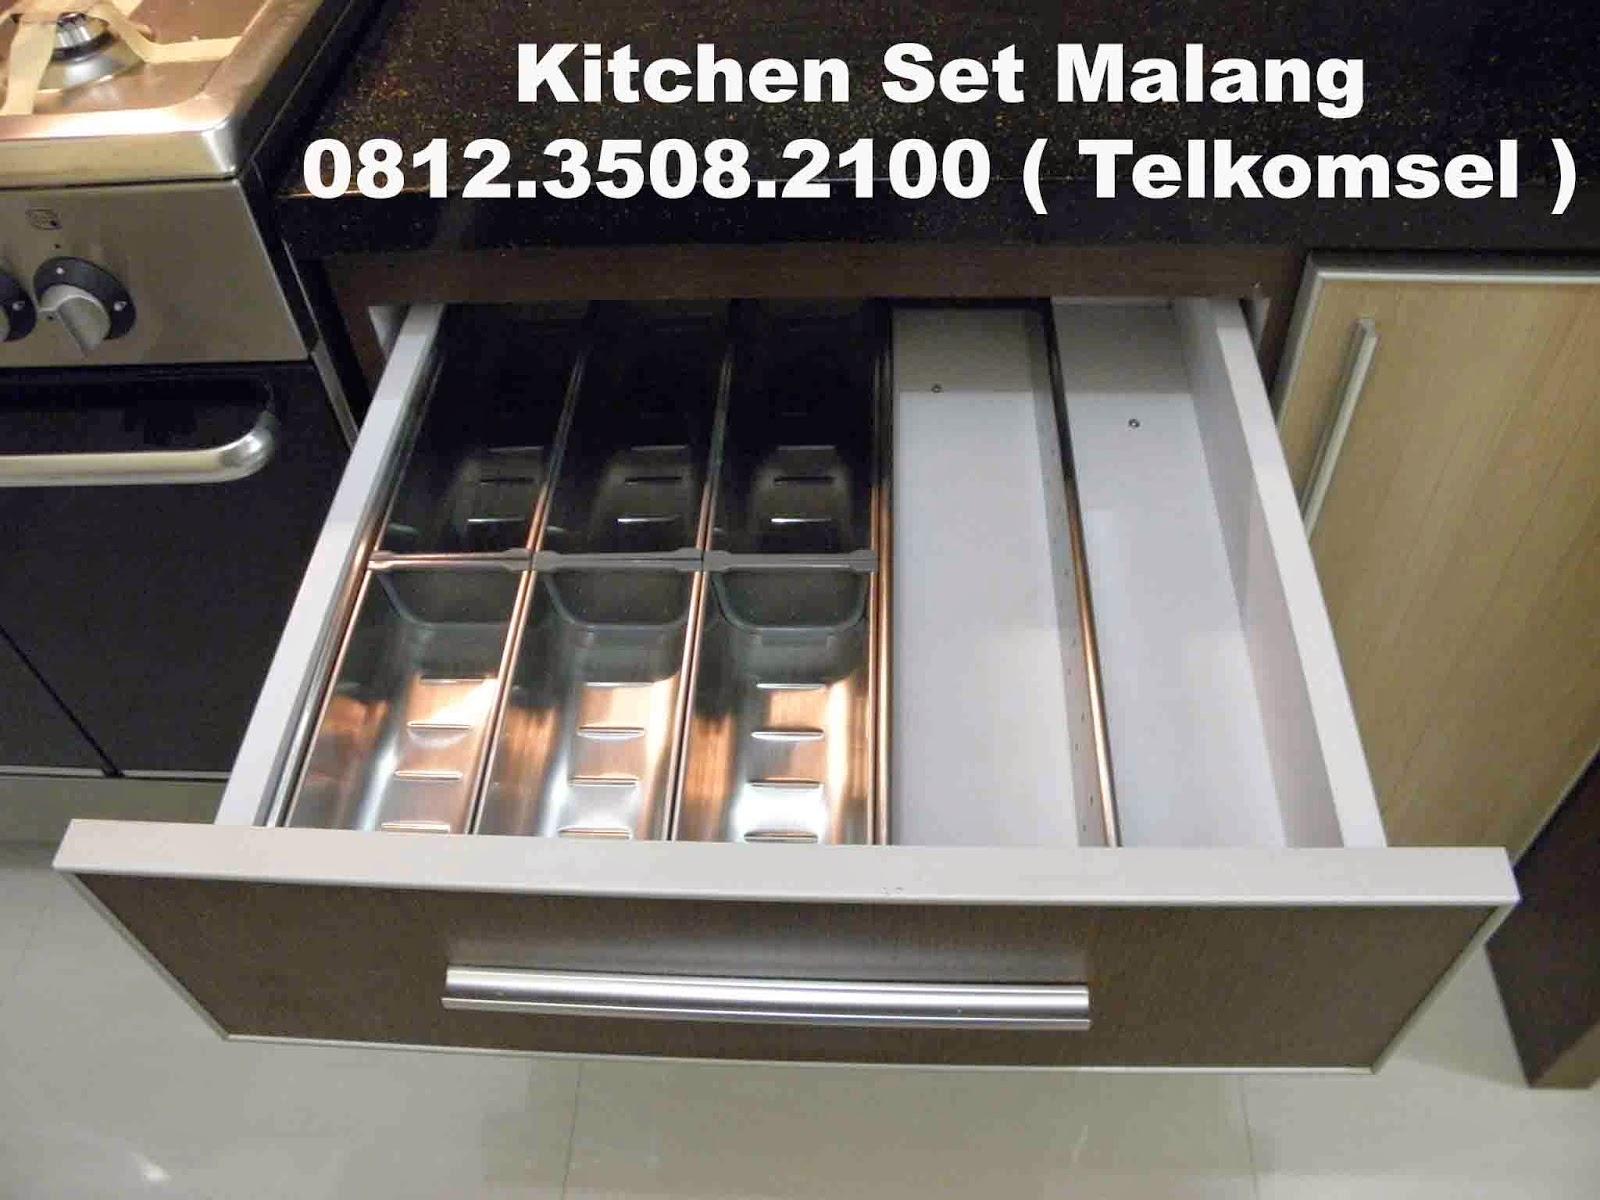 Harga Kitchen Set Malang Toko Kitchen Set Malang Pesan Kitchen